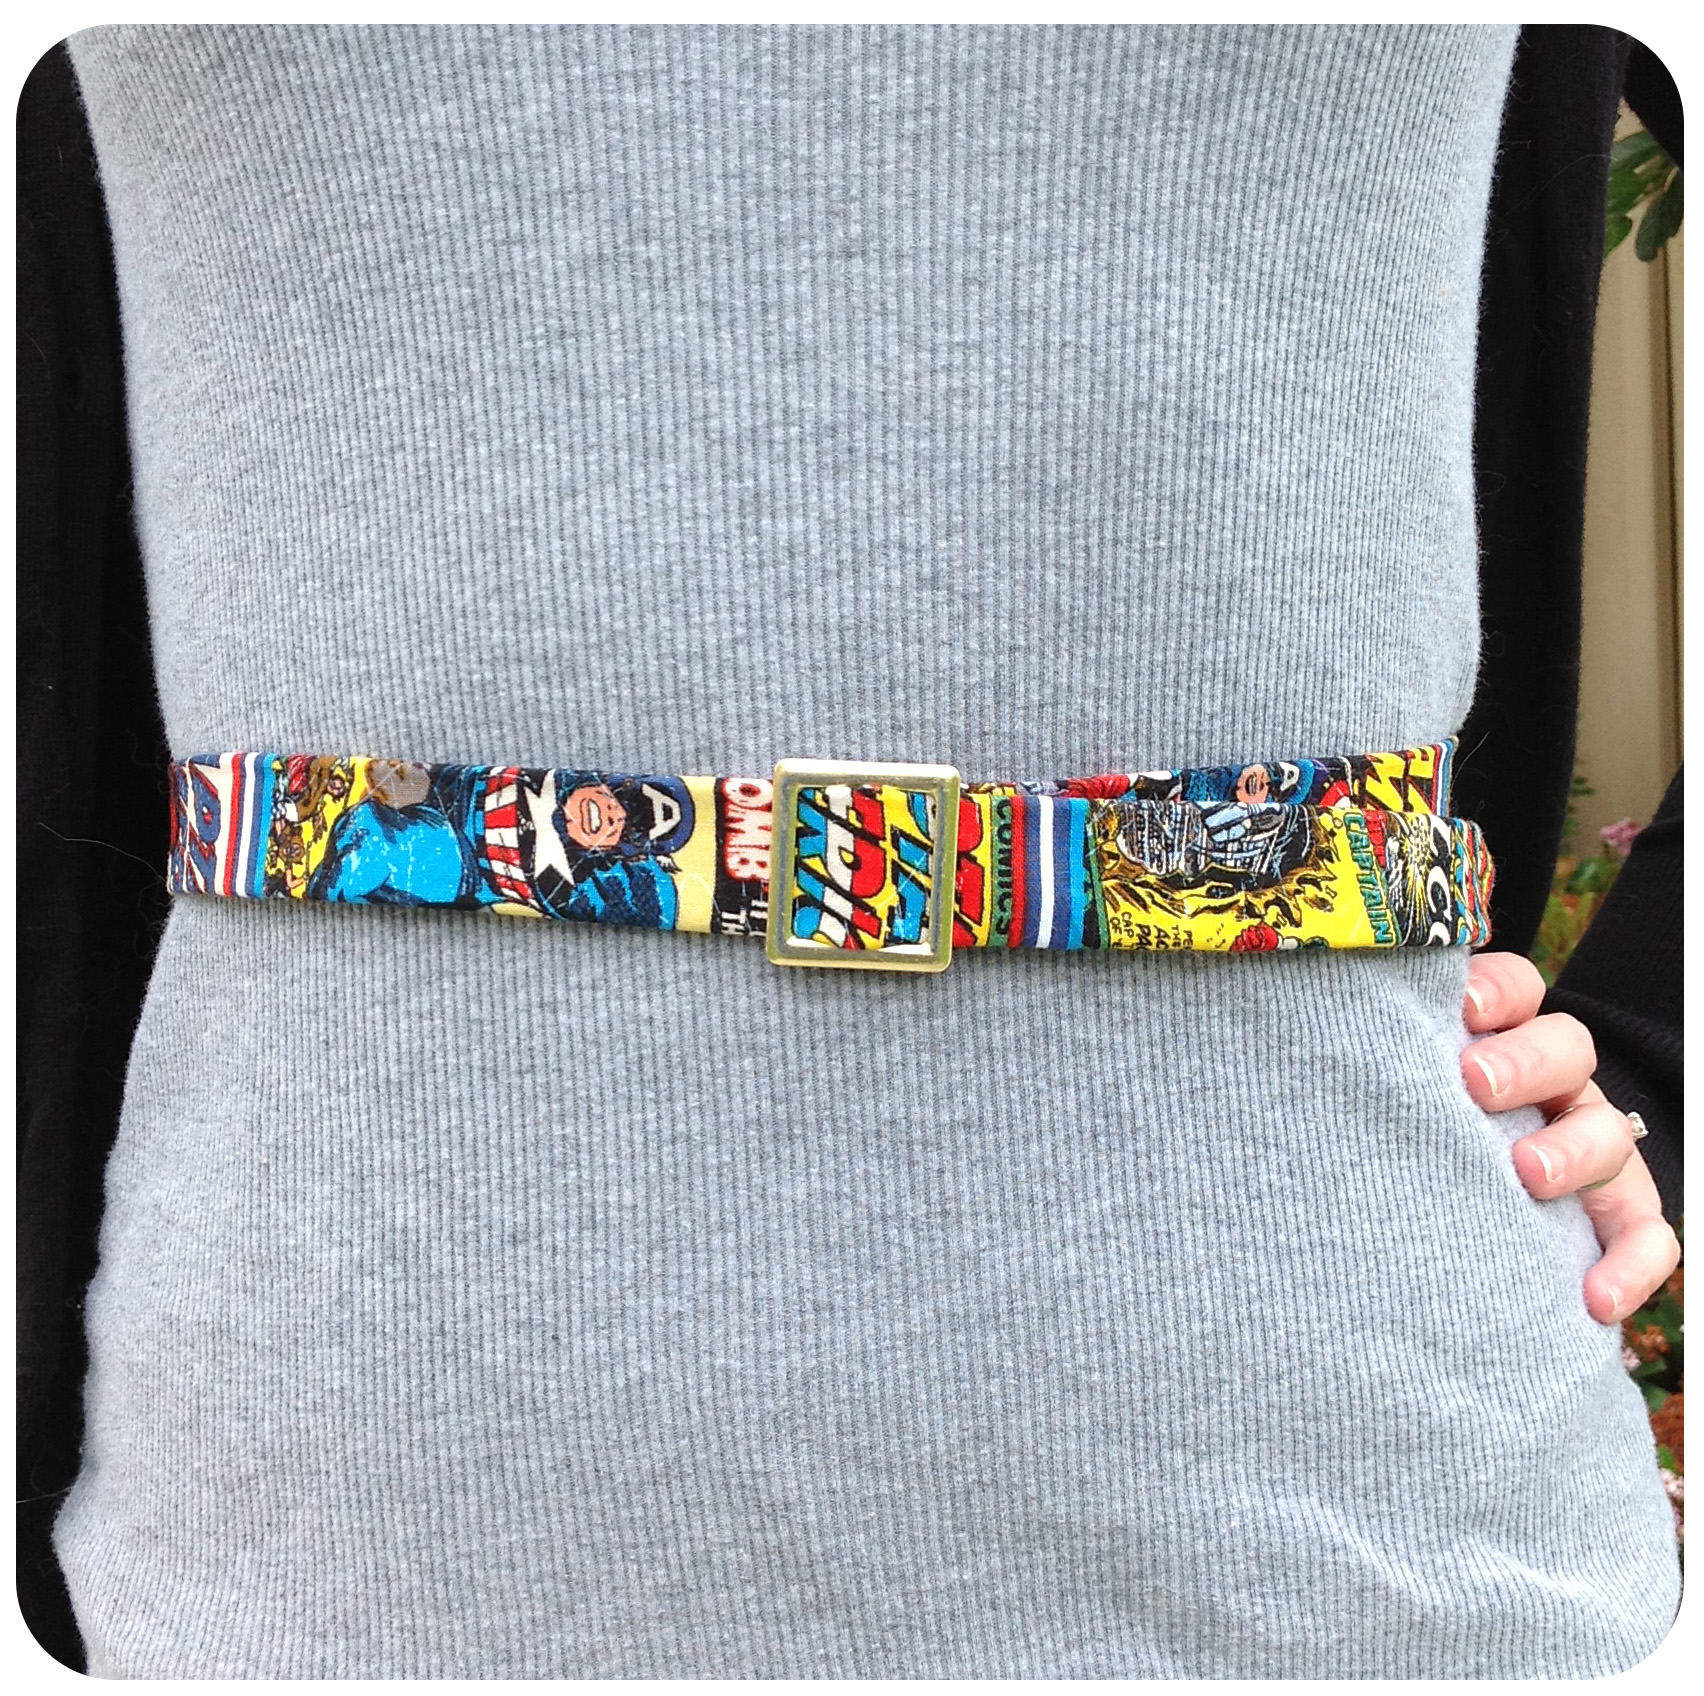 Diy friday captain america fabric belt set to stunning for Zerrissene jeans selber machen